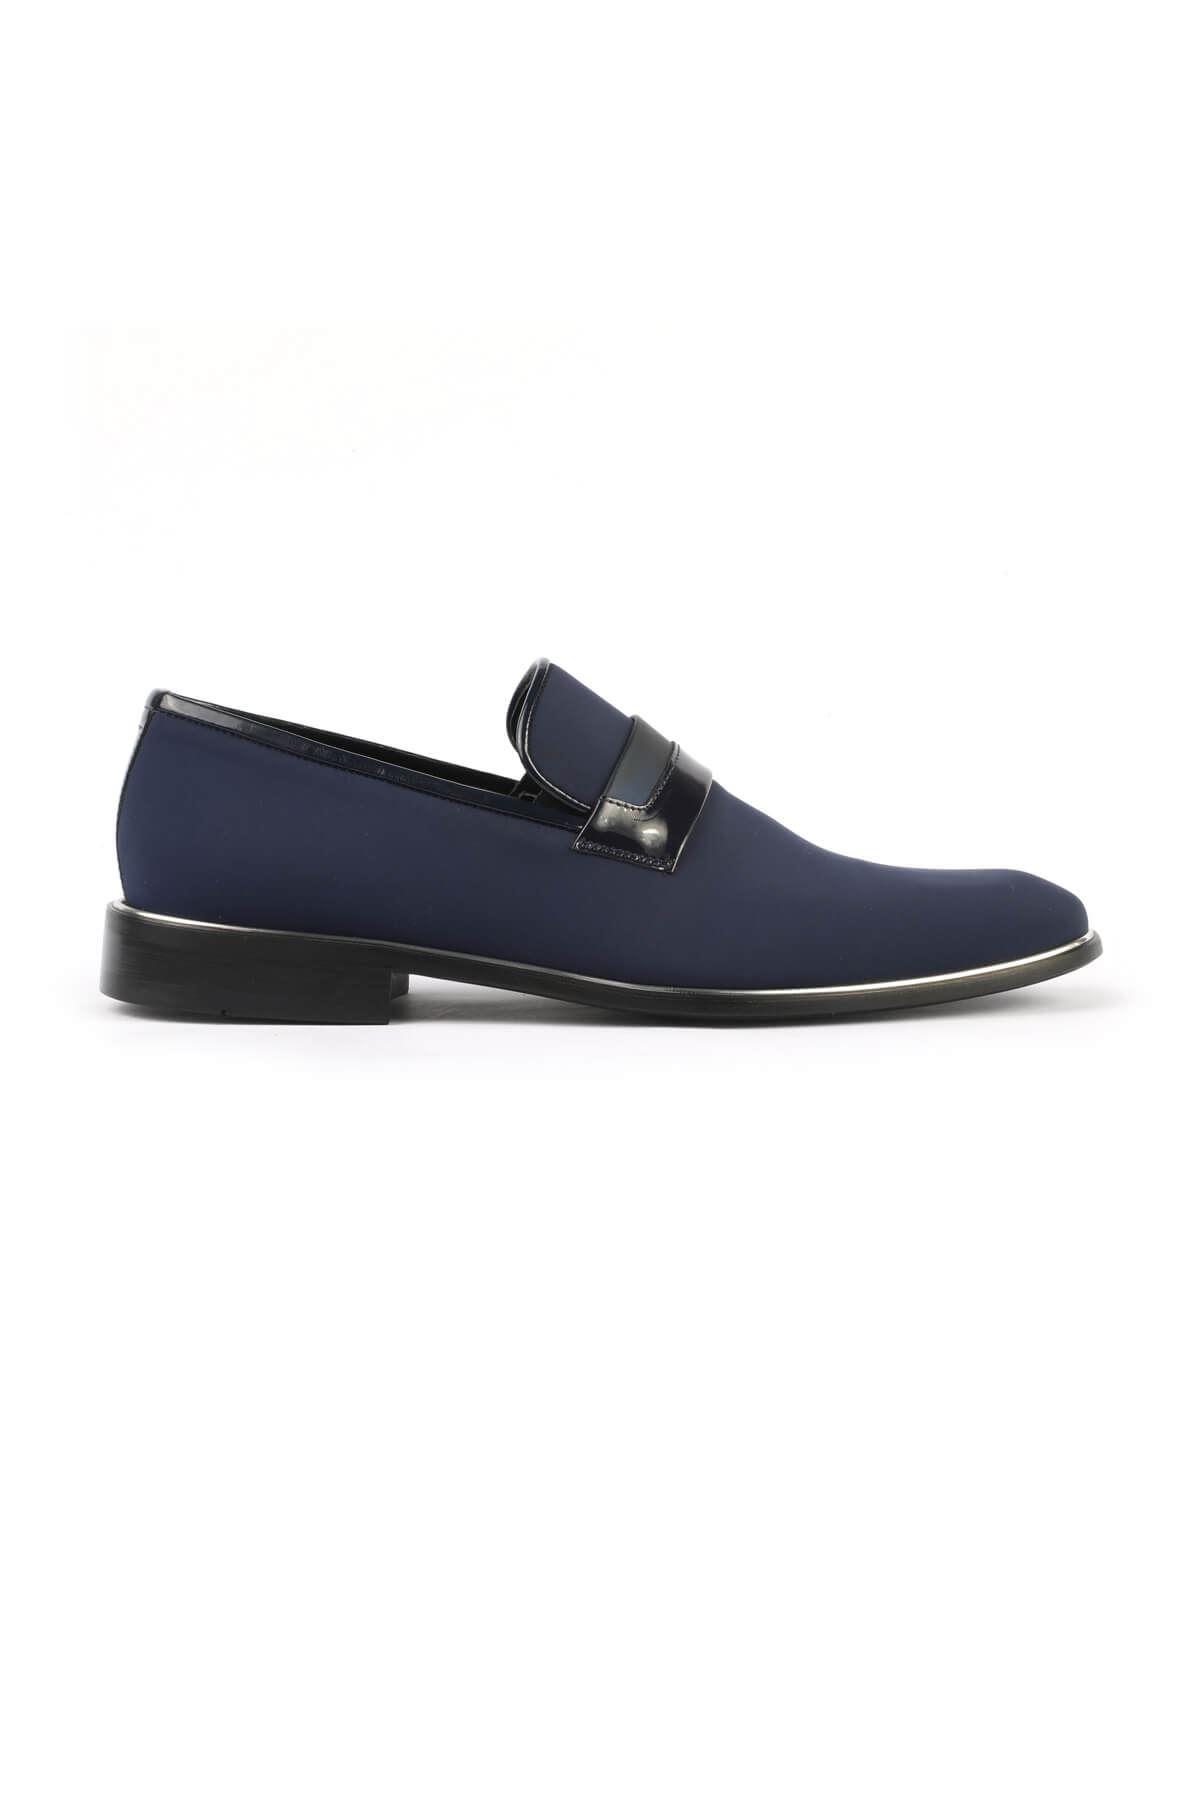 Libero 2602 Navy Blue Classic Shoes